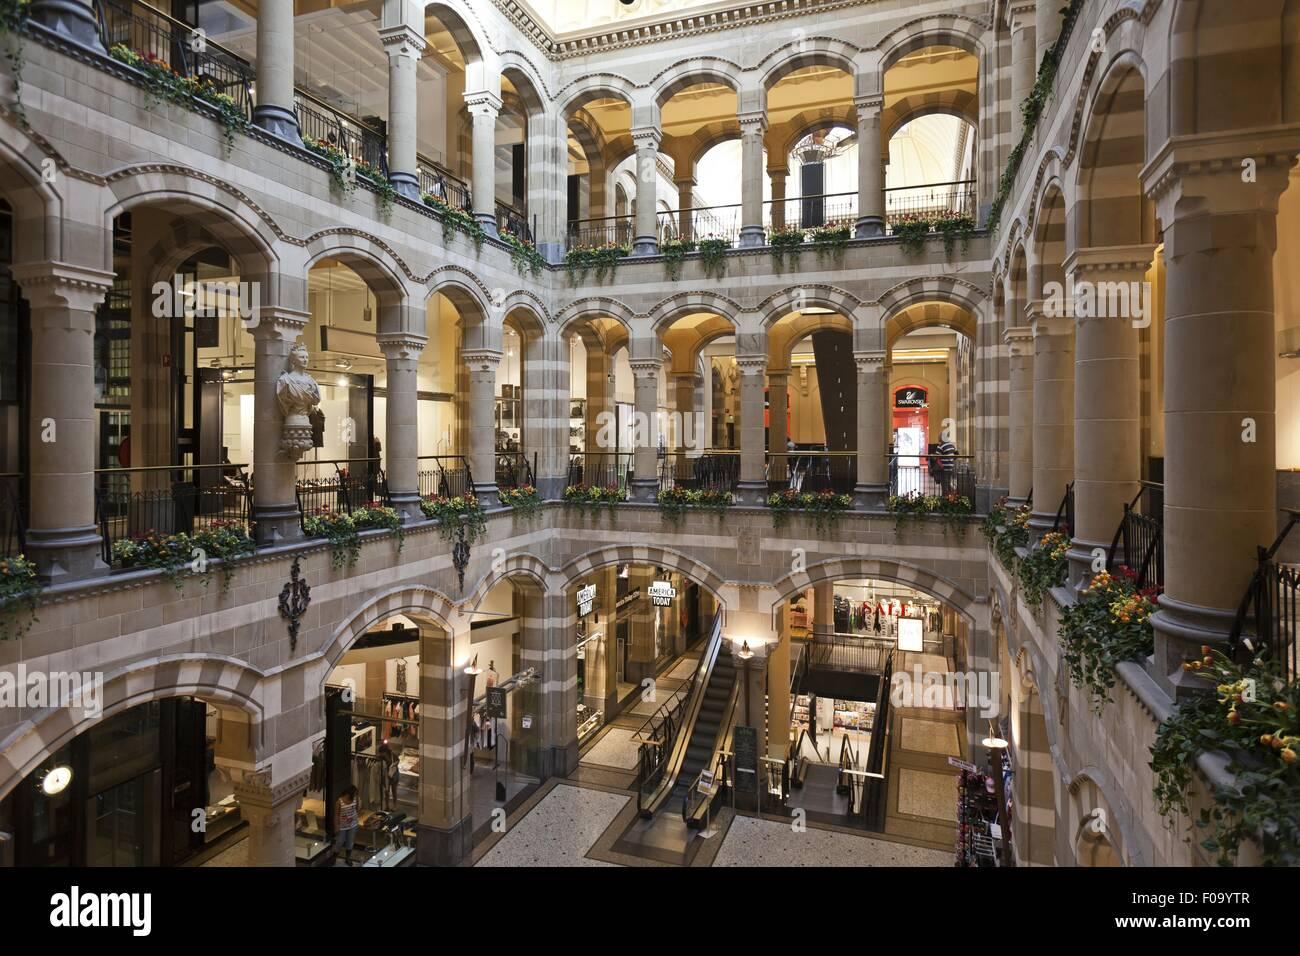 Interior of Magna Plaza department store, Amsterdam